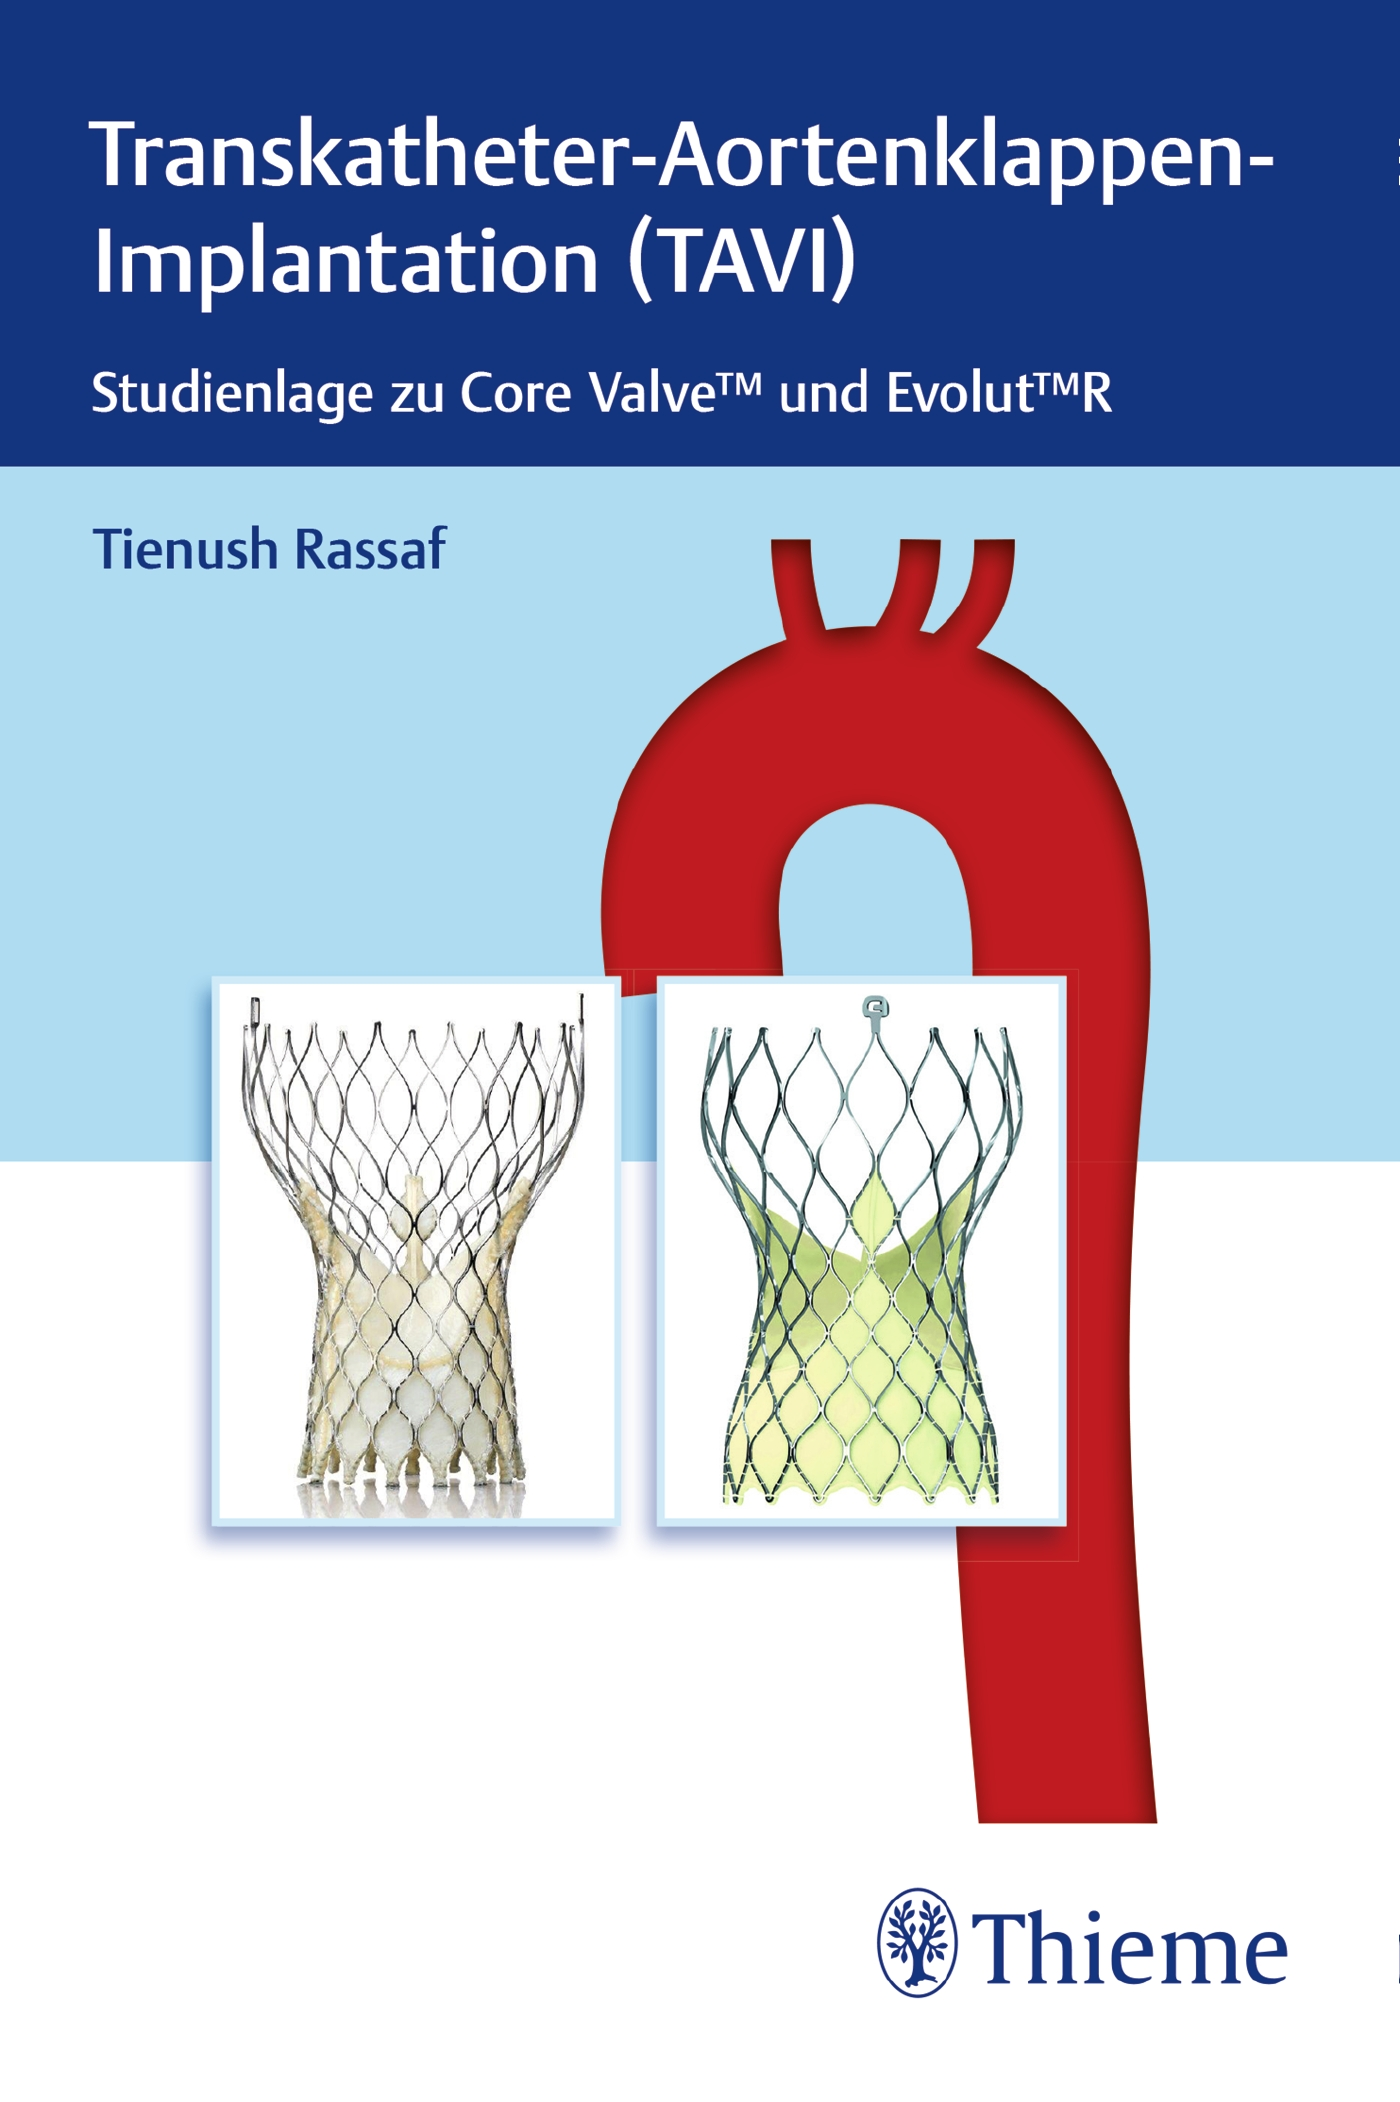 Transkatheter Aortenklappenimplantation (TAVI)